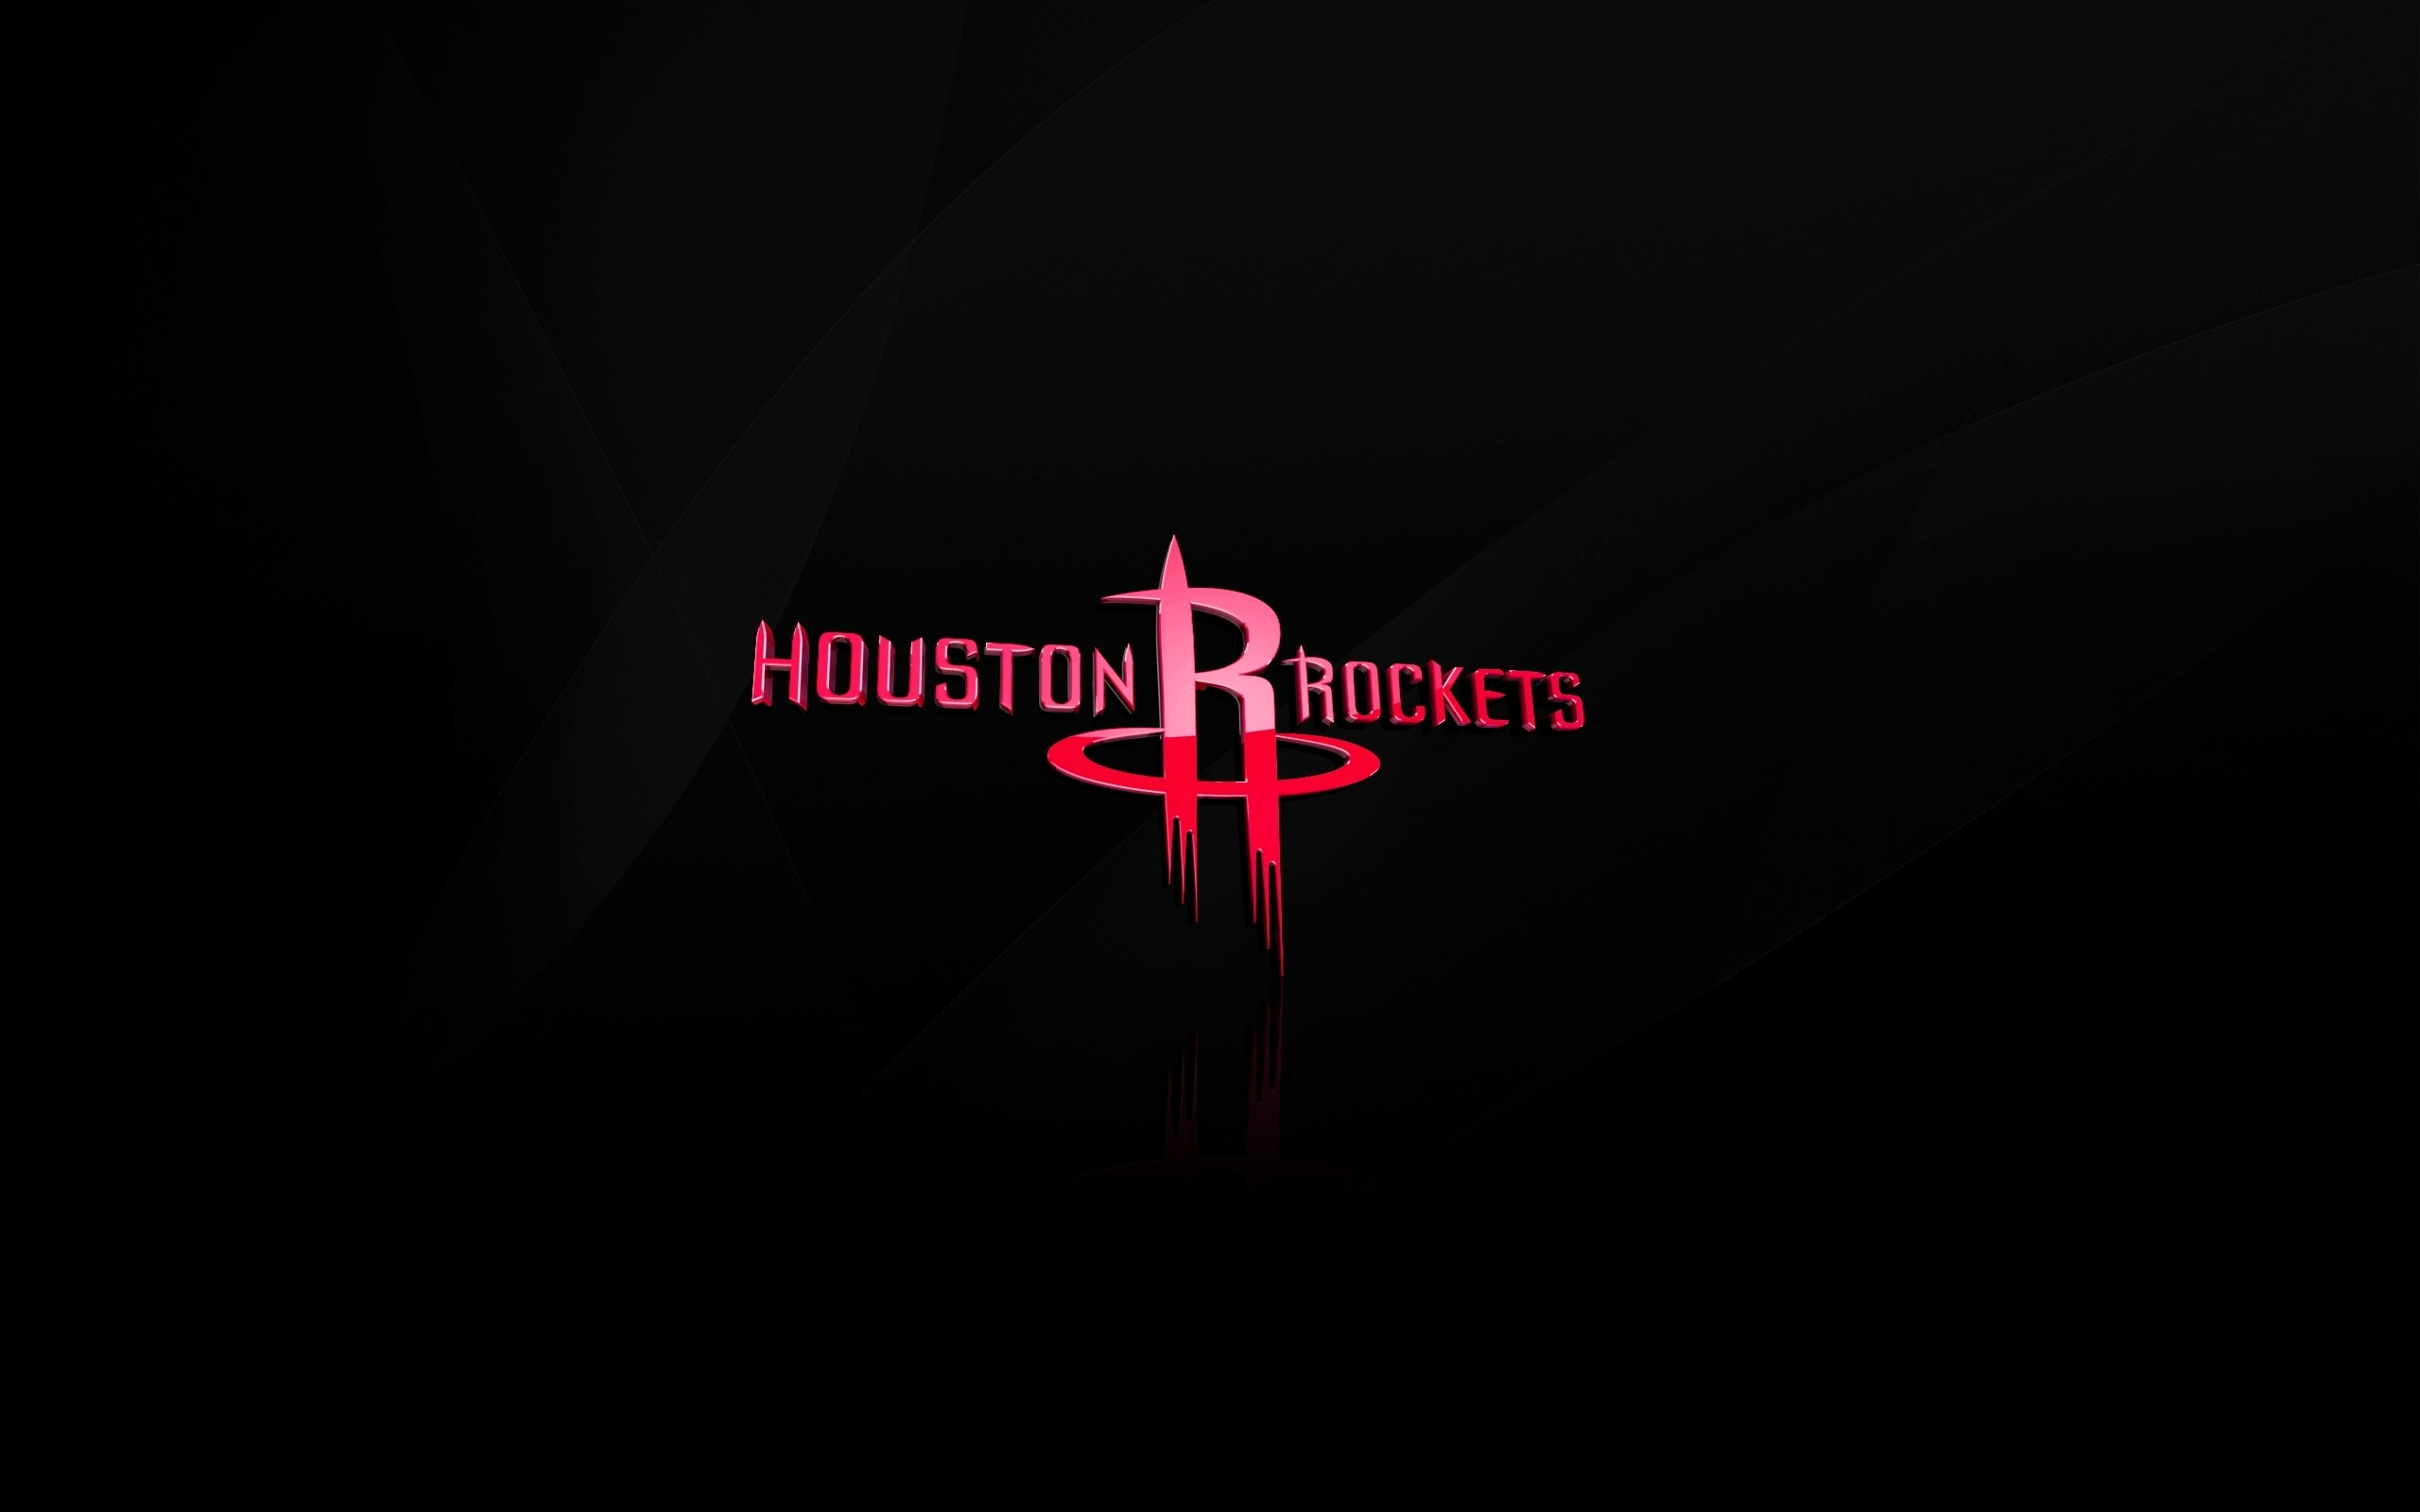 Houston Rockets Wallpaper HD   TopPicture.XYZ